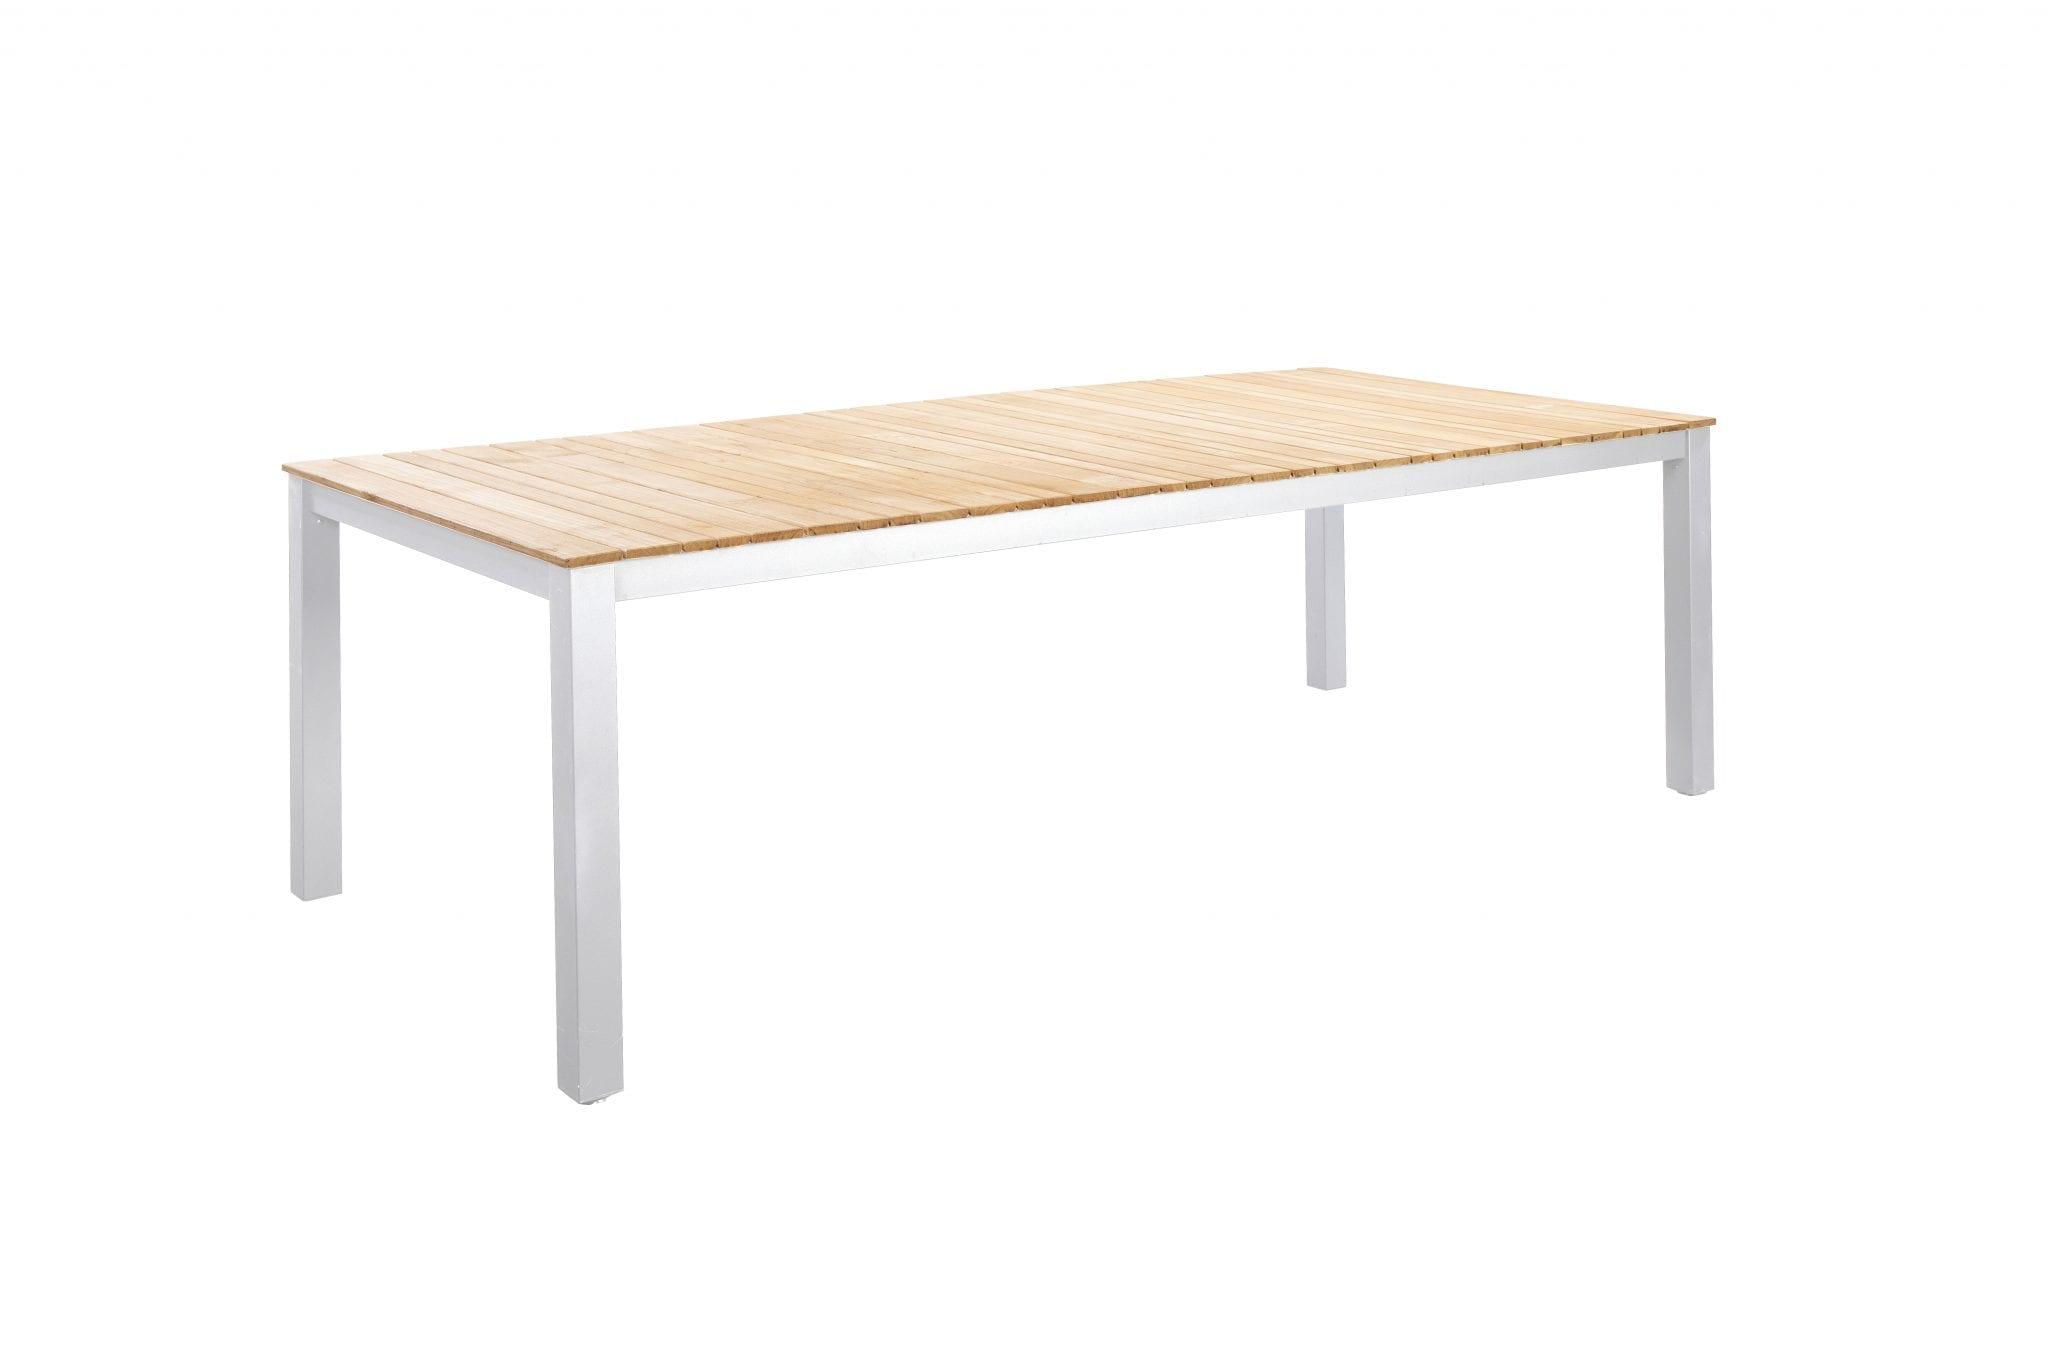 Arashi 220x100 dining table - white | Yoi Furniture